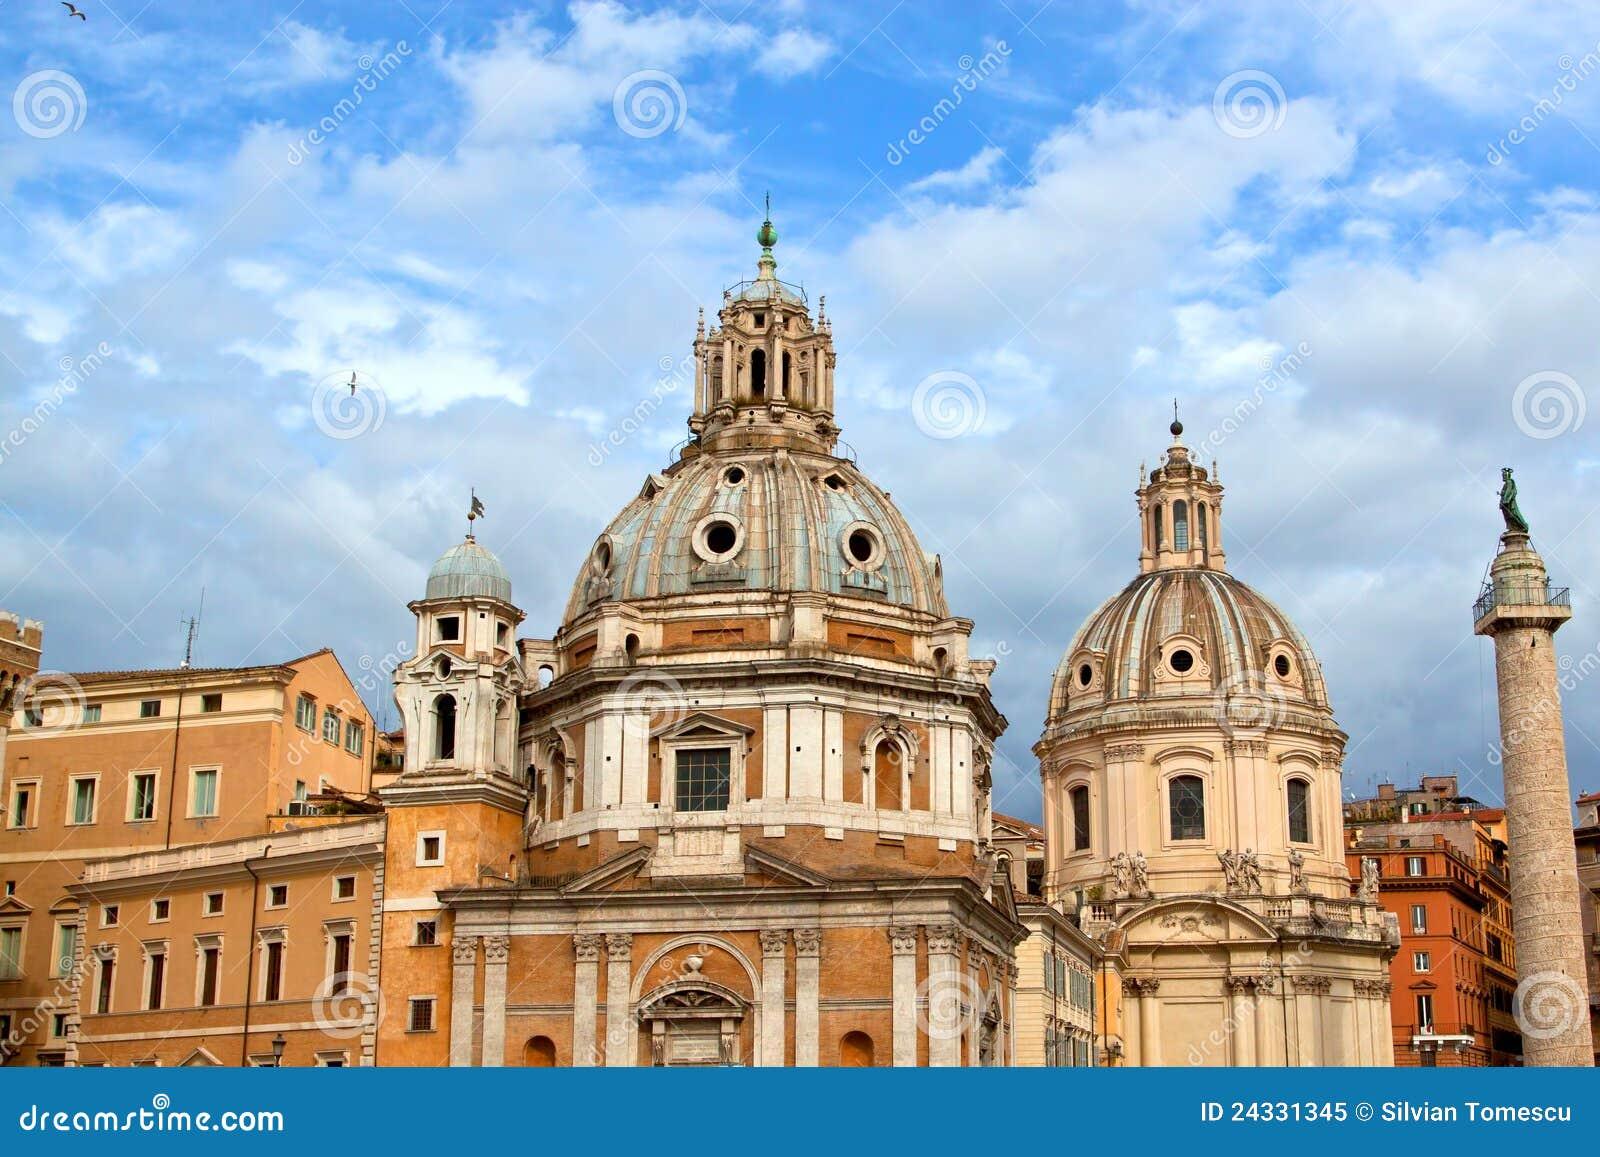 wichtige kirchen in rome - photo#3